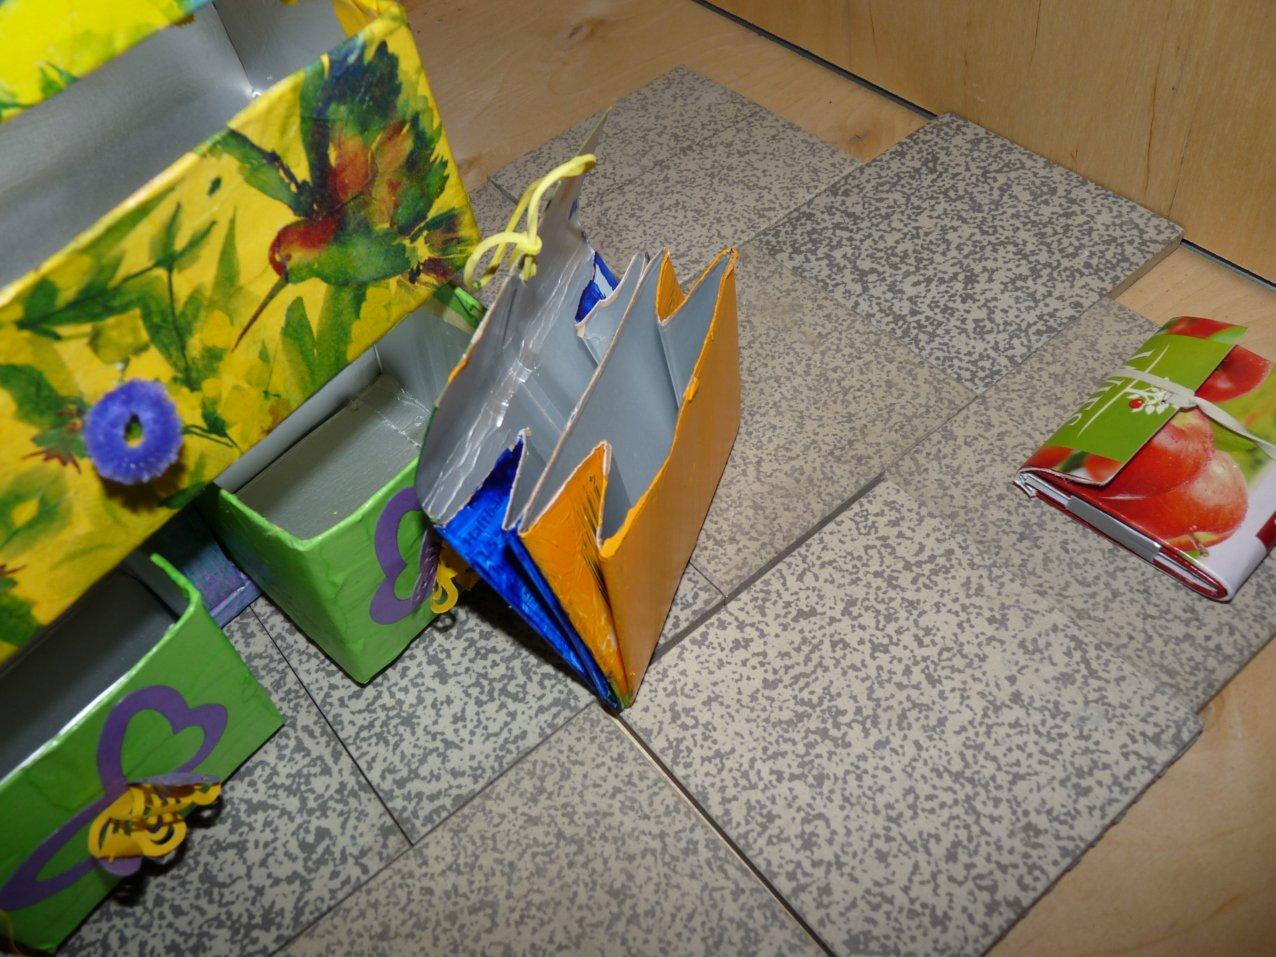 geldboerse-ausverbundverpackungen